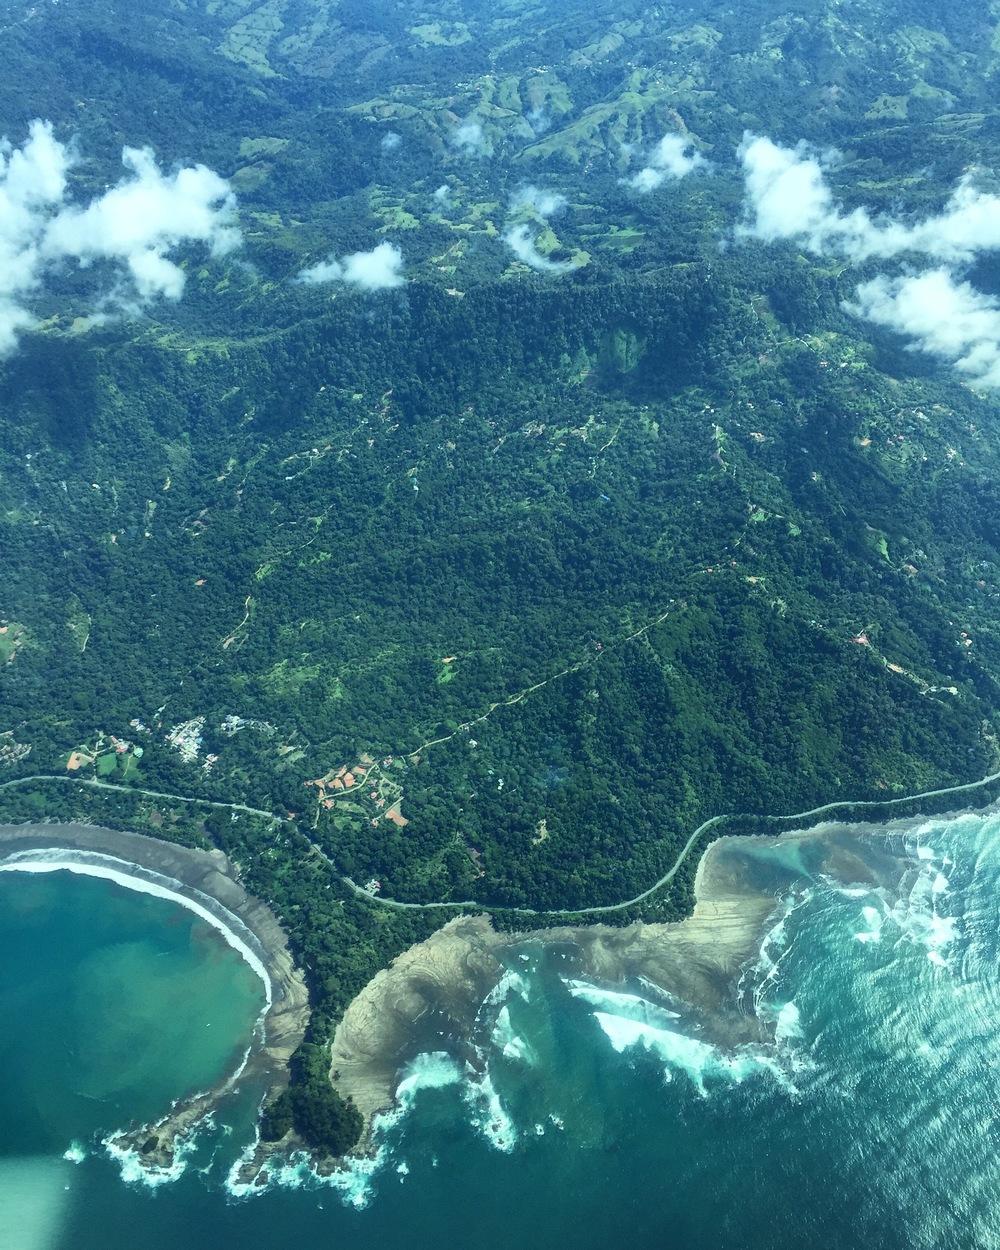 Views to Puerto Jimenez from San Jose - Rainforest, Coast & Sea